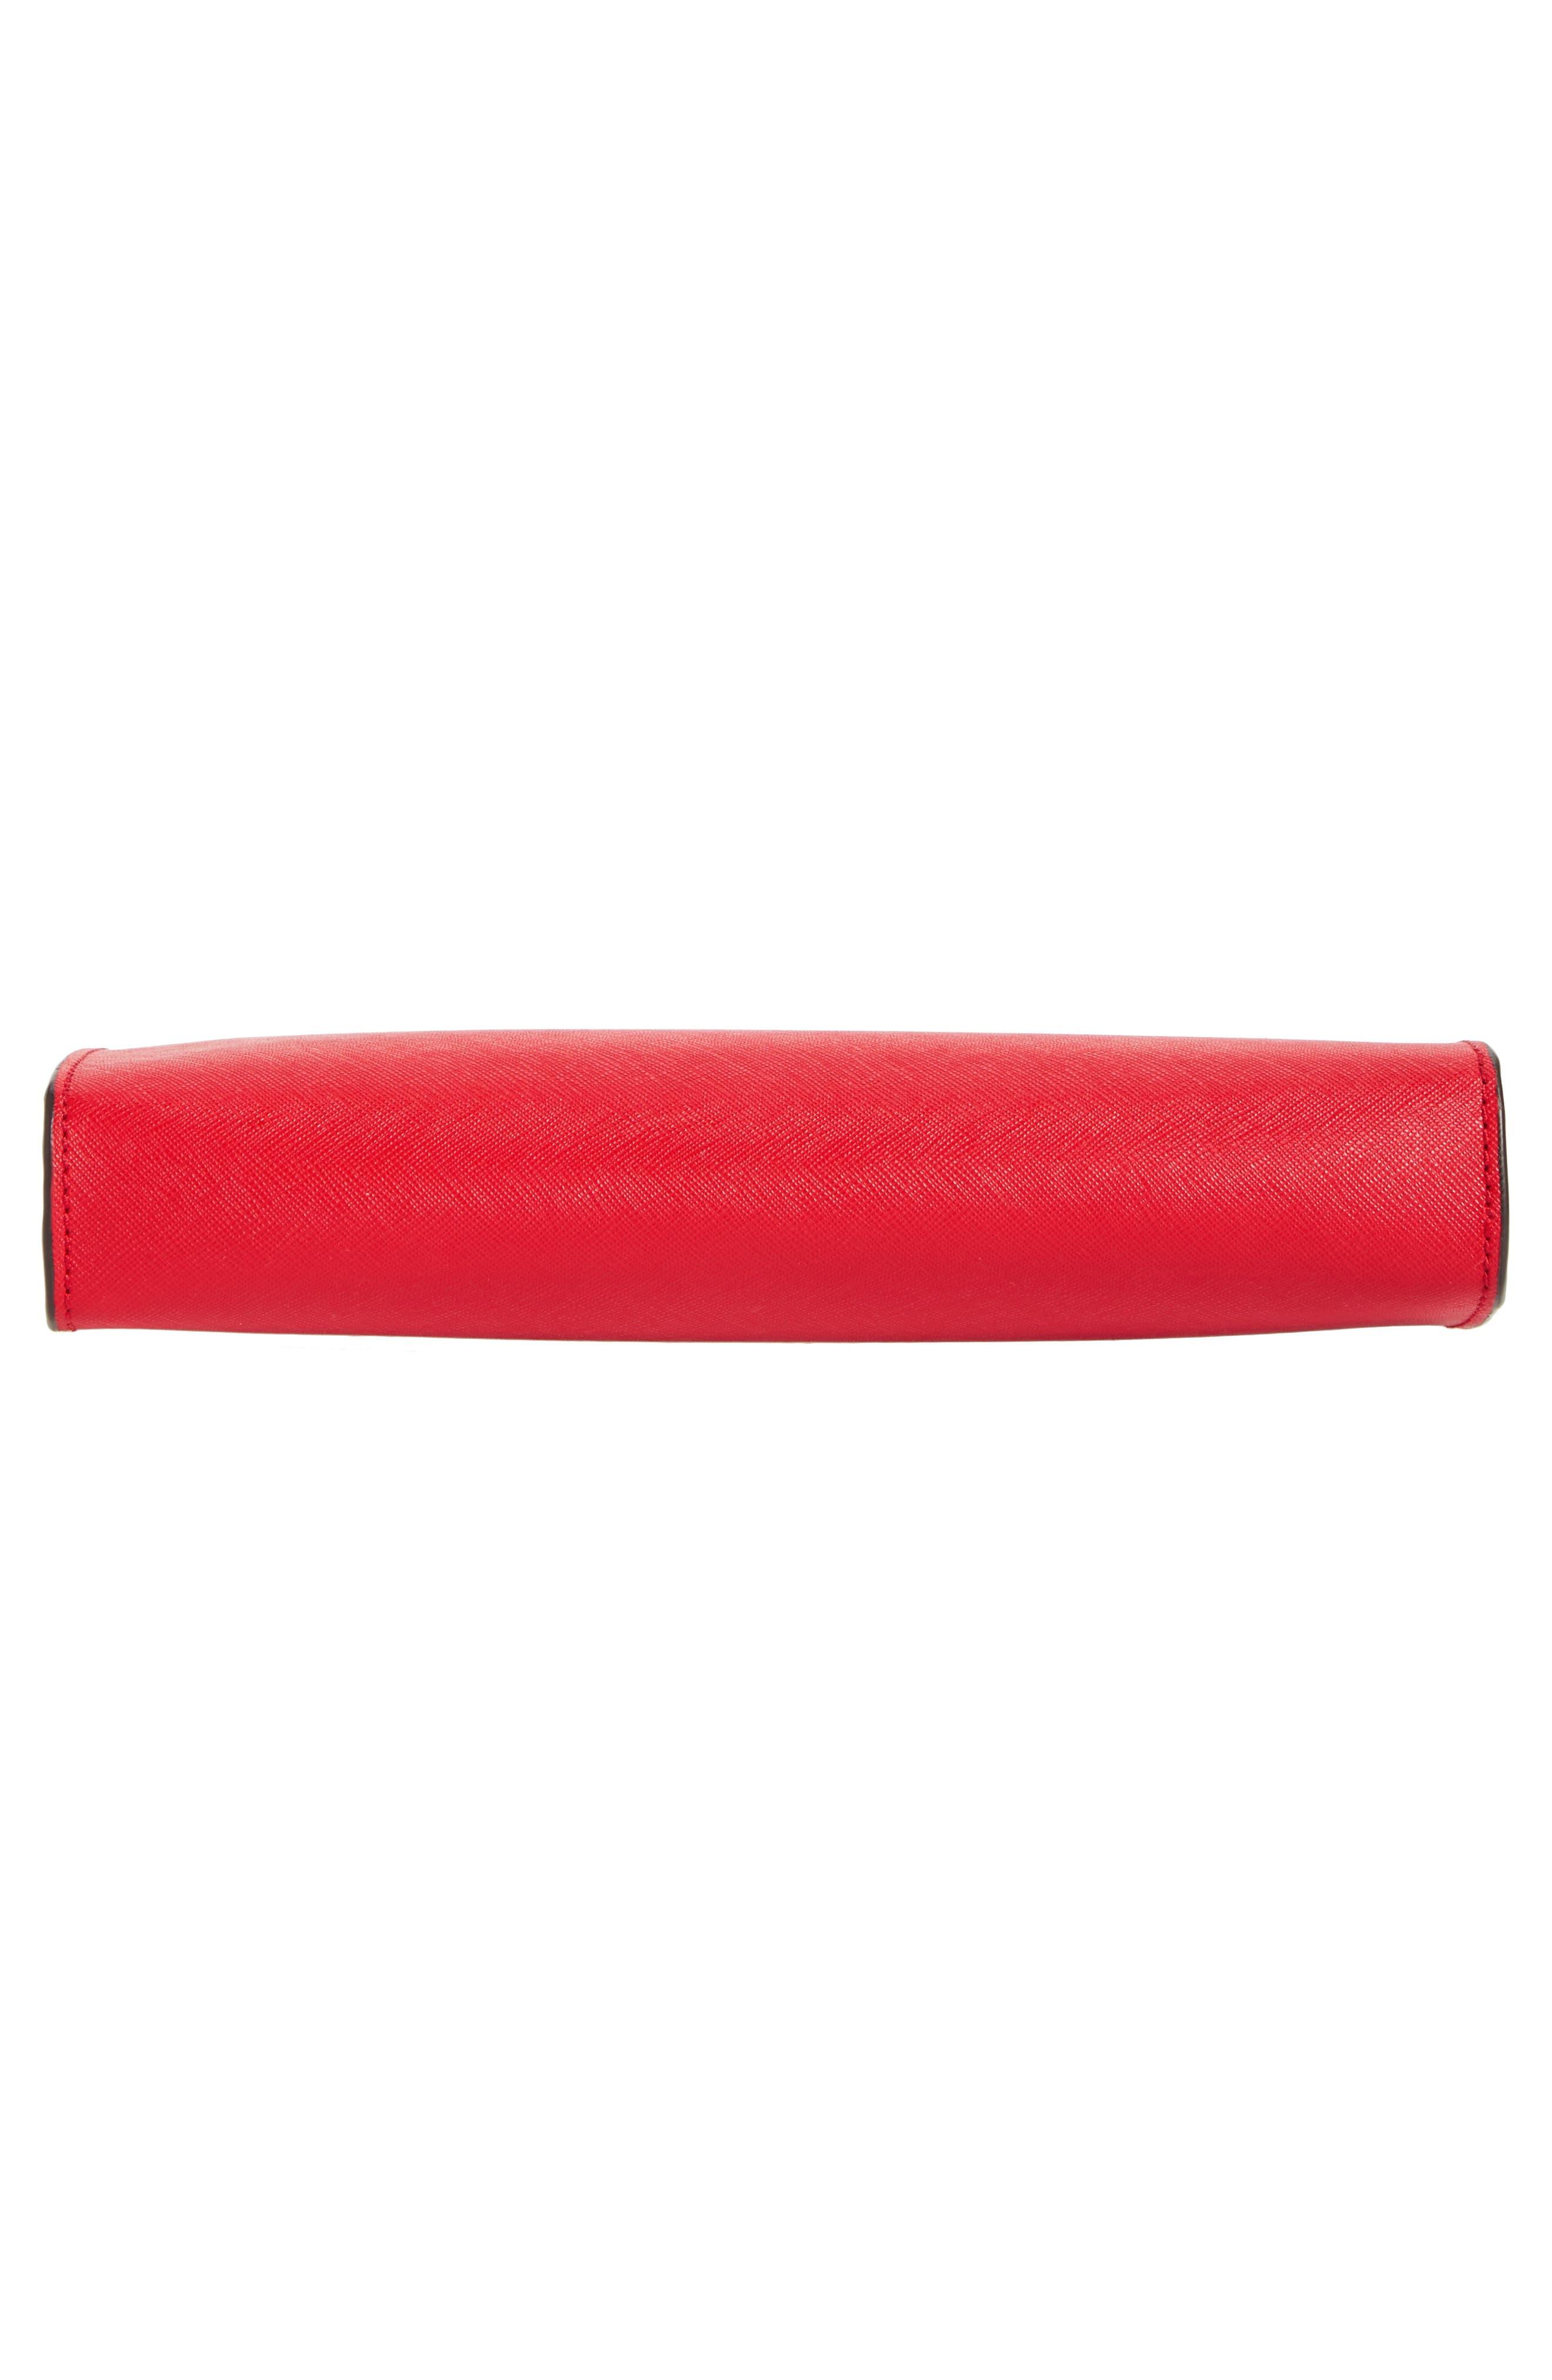 'Large Jet Set Travel' Crossbody Bag,                             Alternate thumbnail 6, color,                             Bright Red